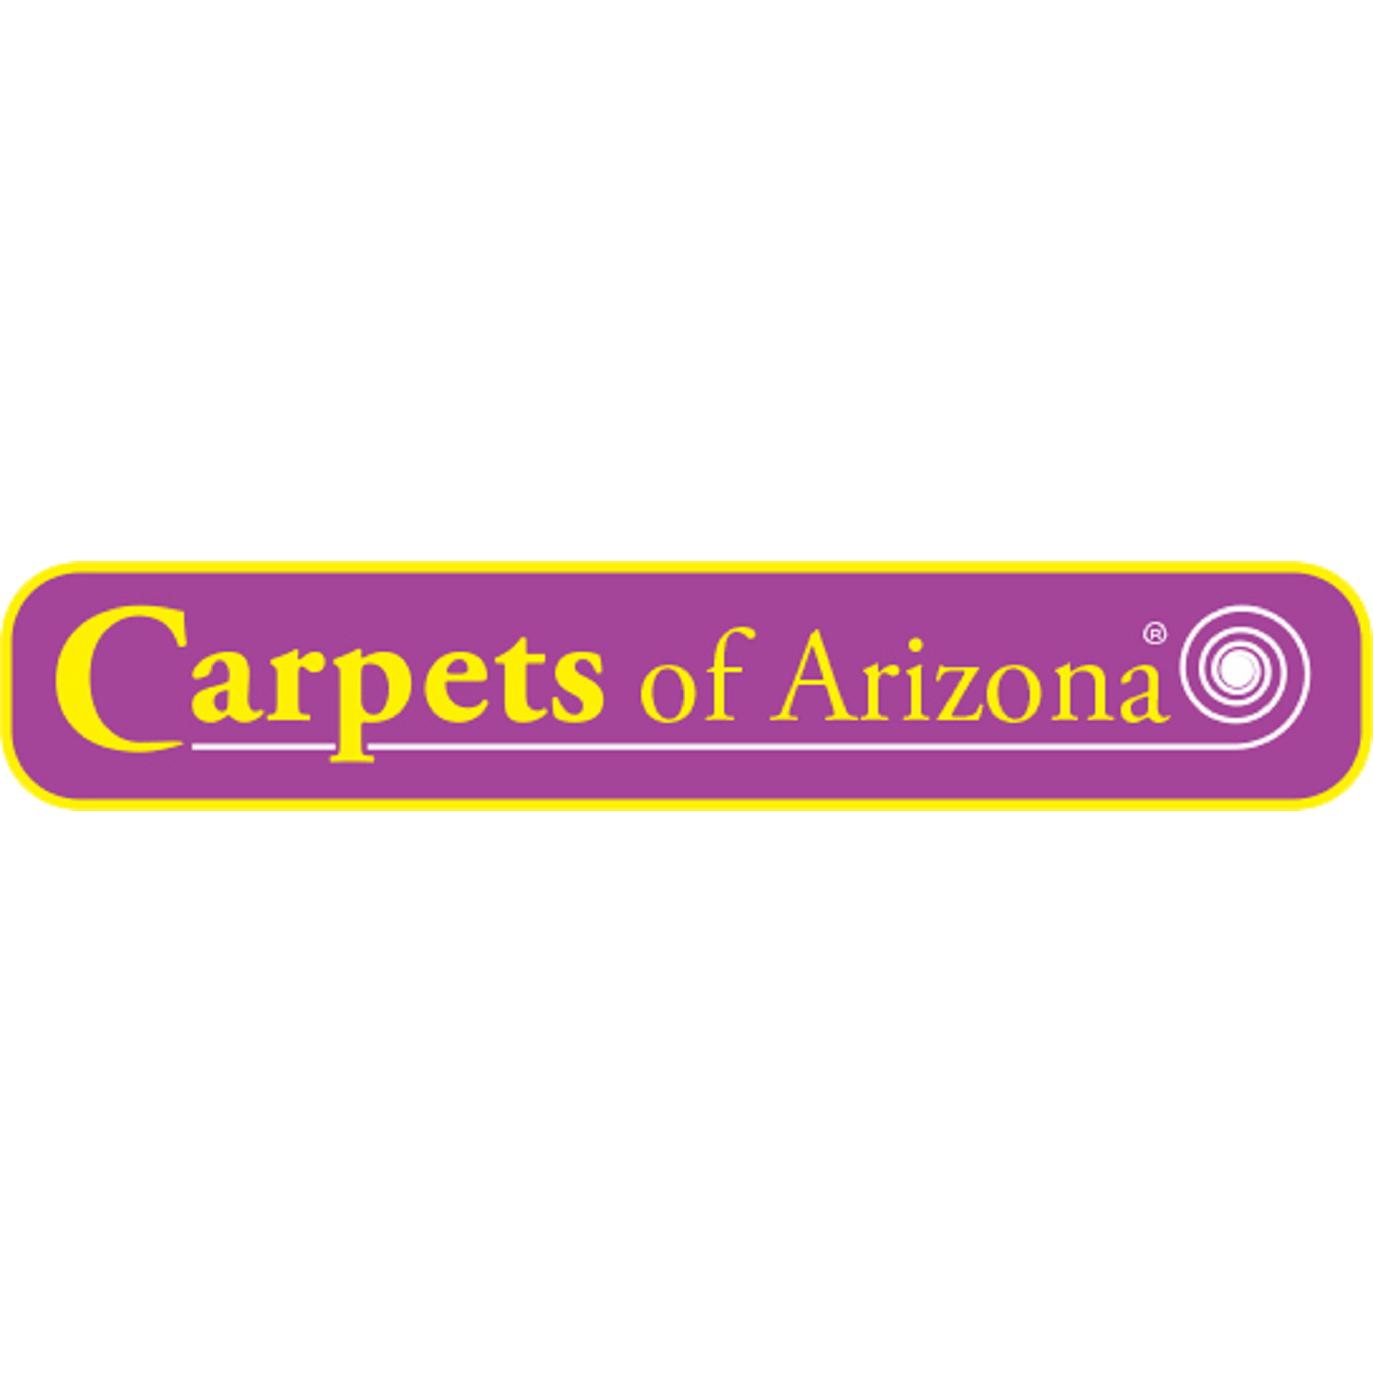 Carpets of Arizona